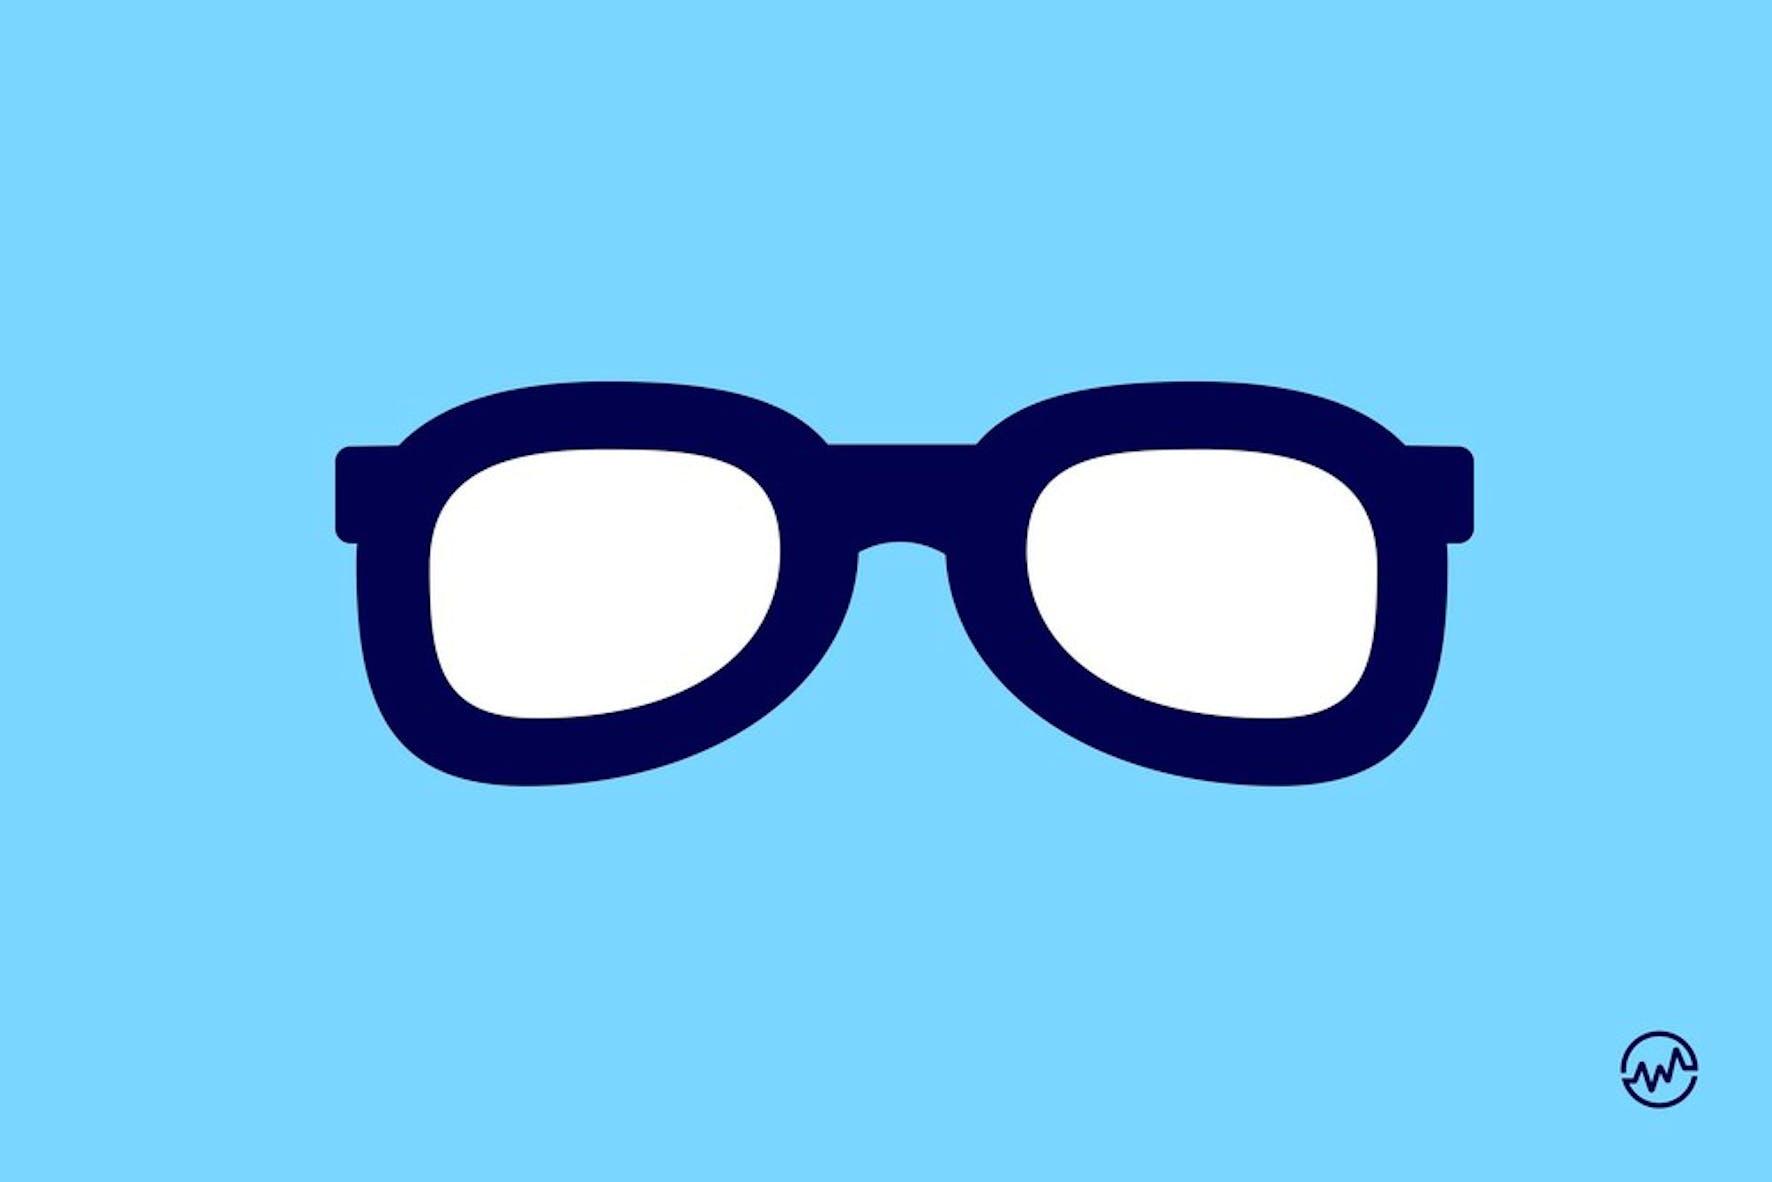 Blue eyeglasses on a blue background